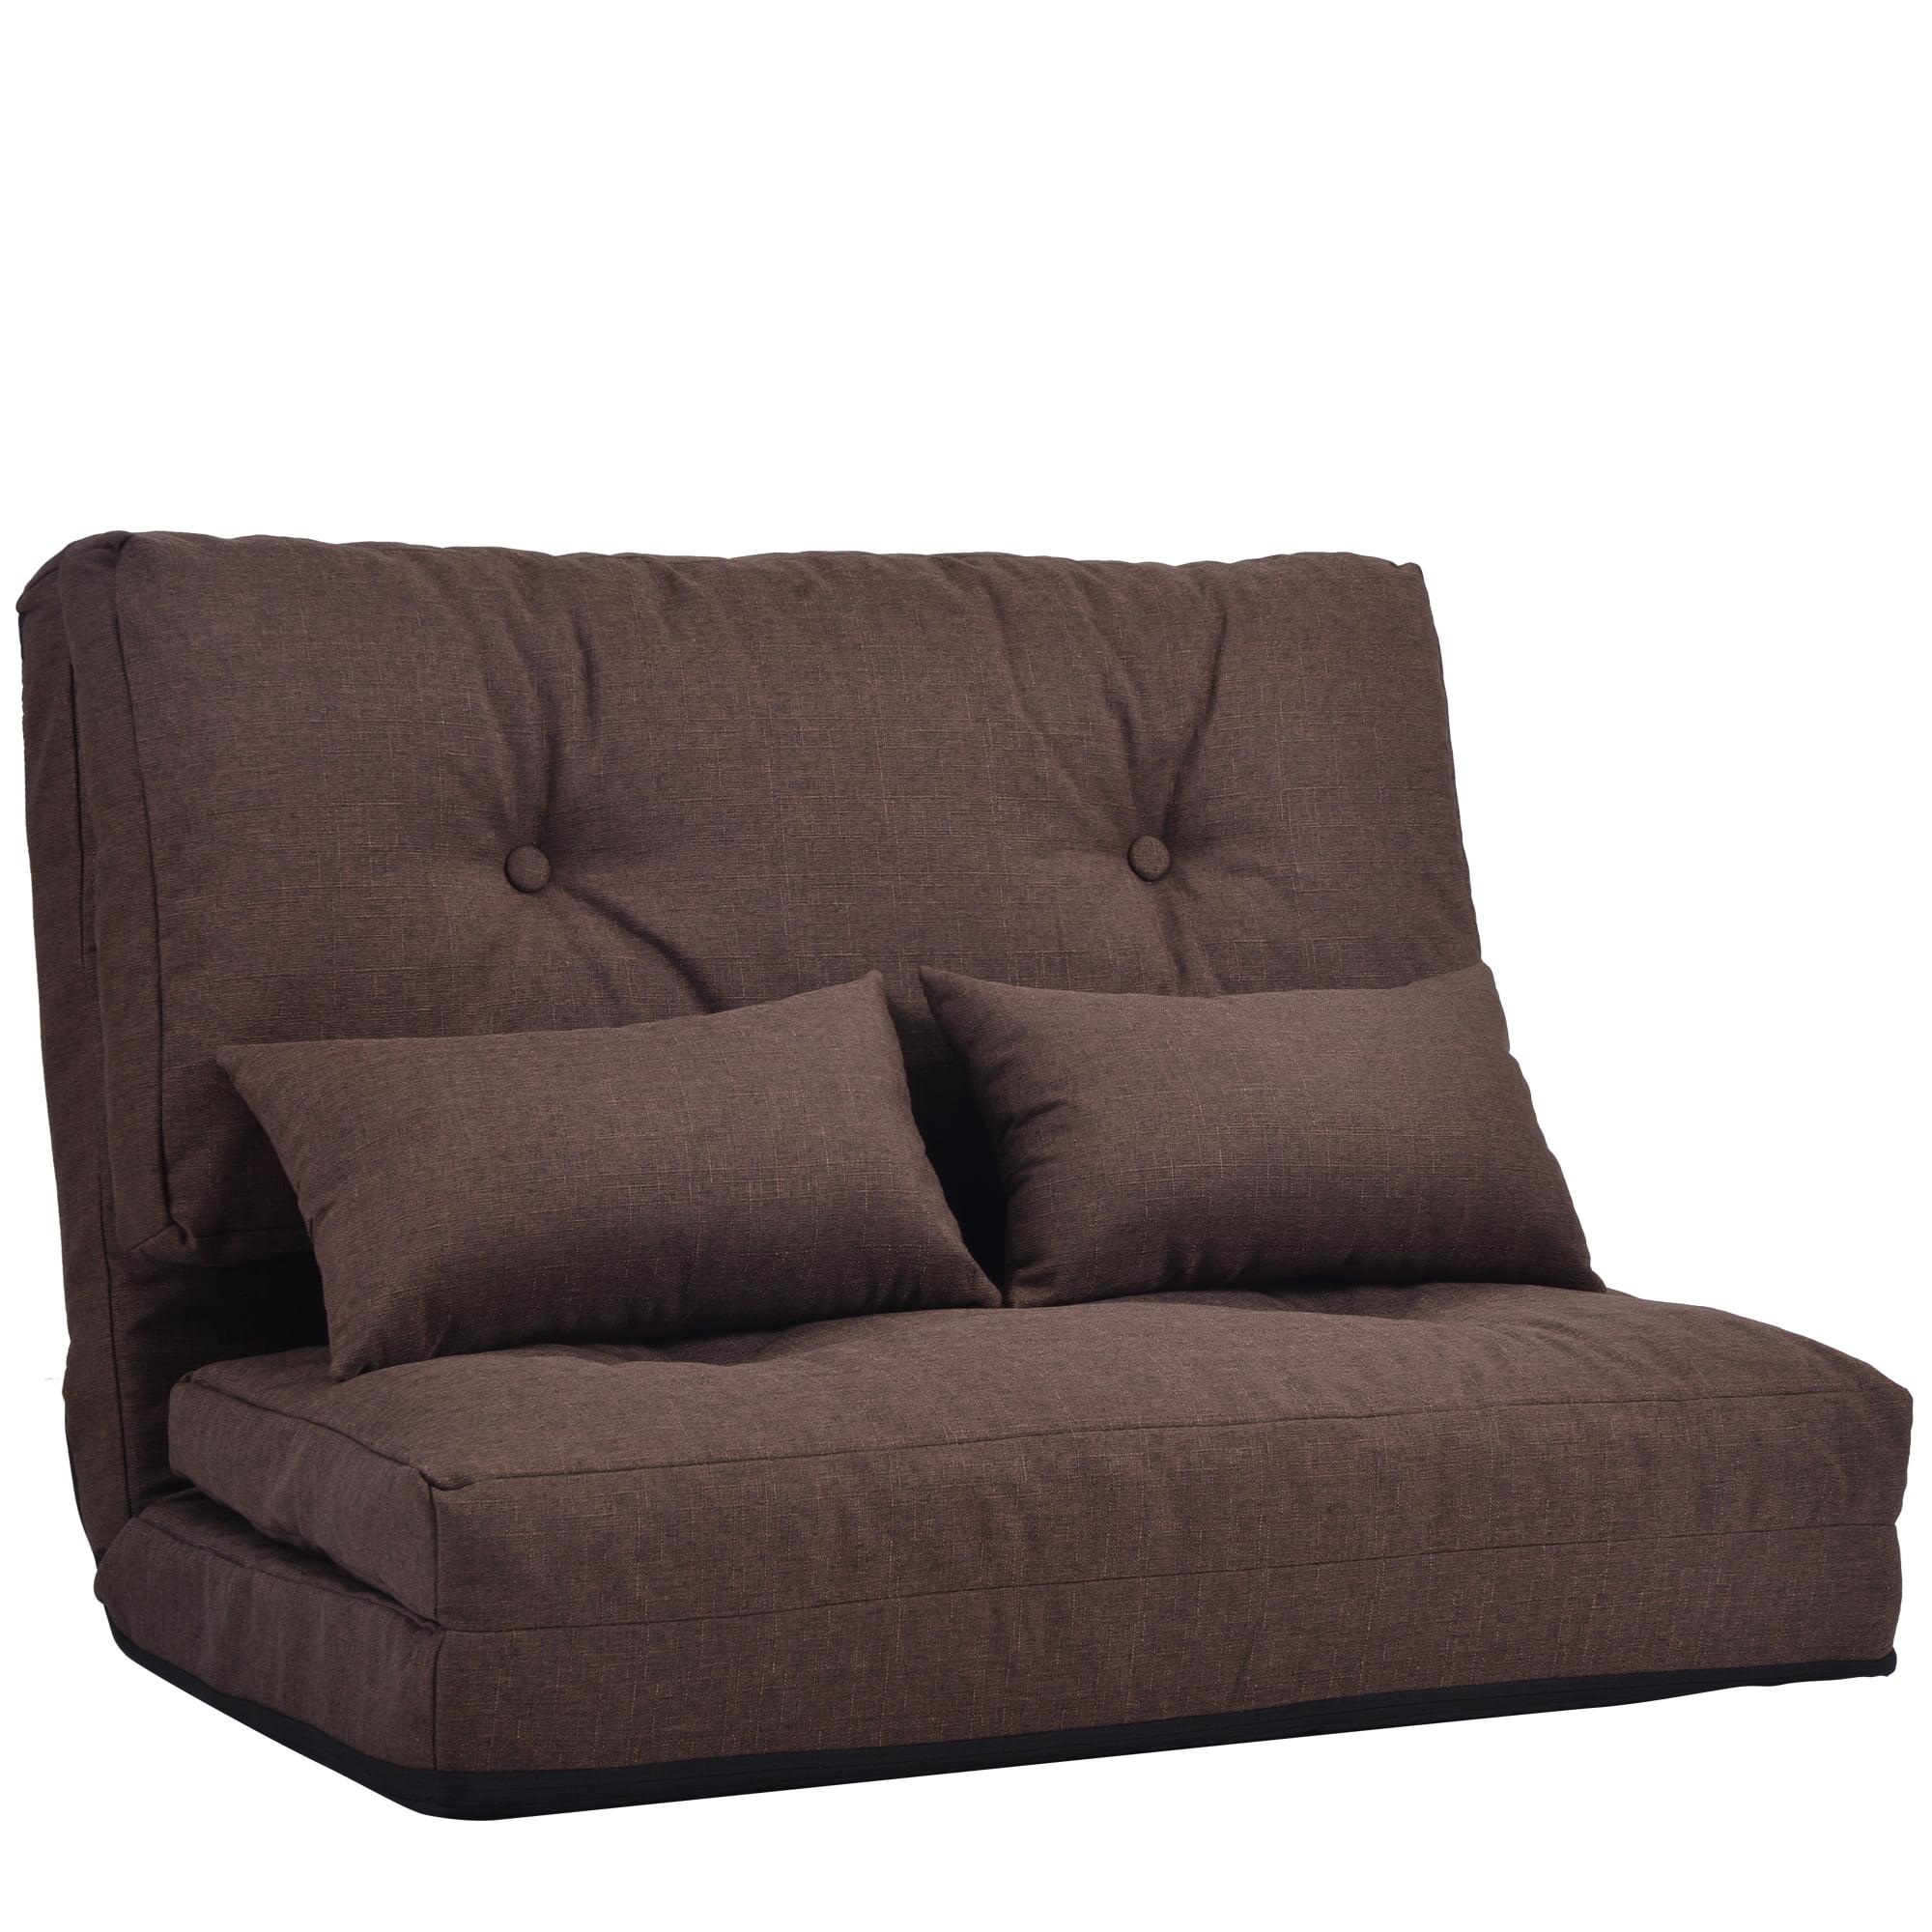 Floor Sofa Bed Folding Futon Chaise